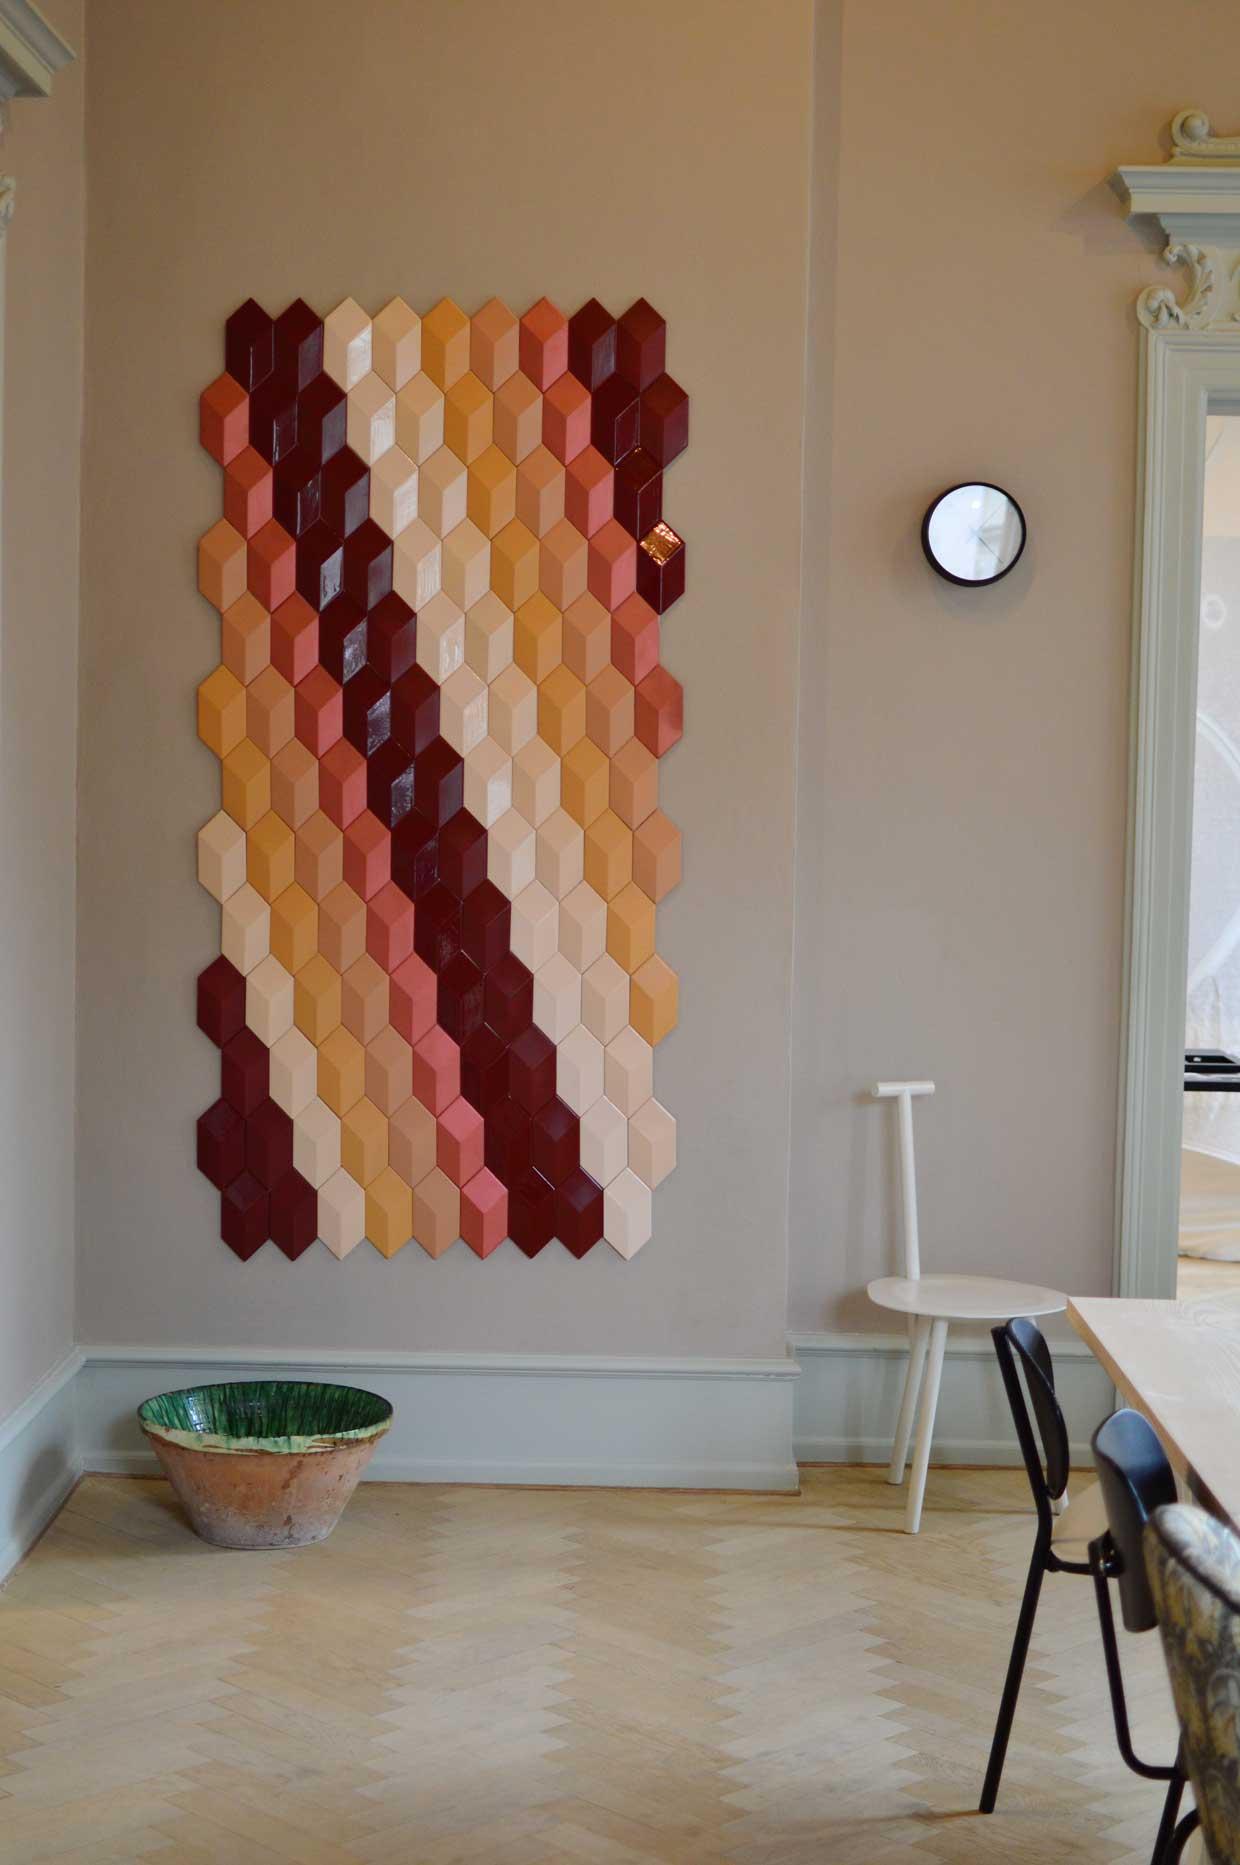 File Under Pop, 3 Days of Design Copenhagen | Yellowtrace